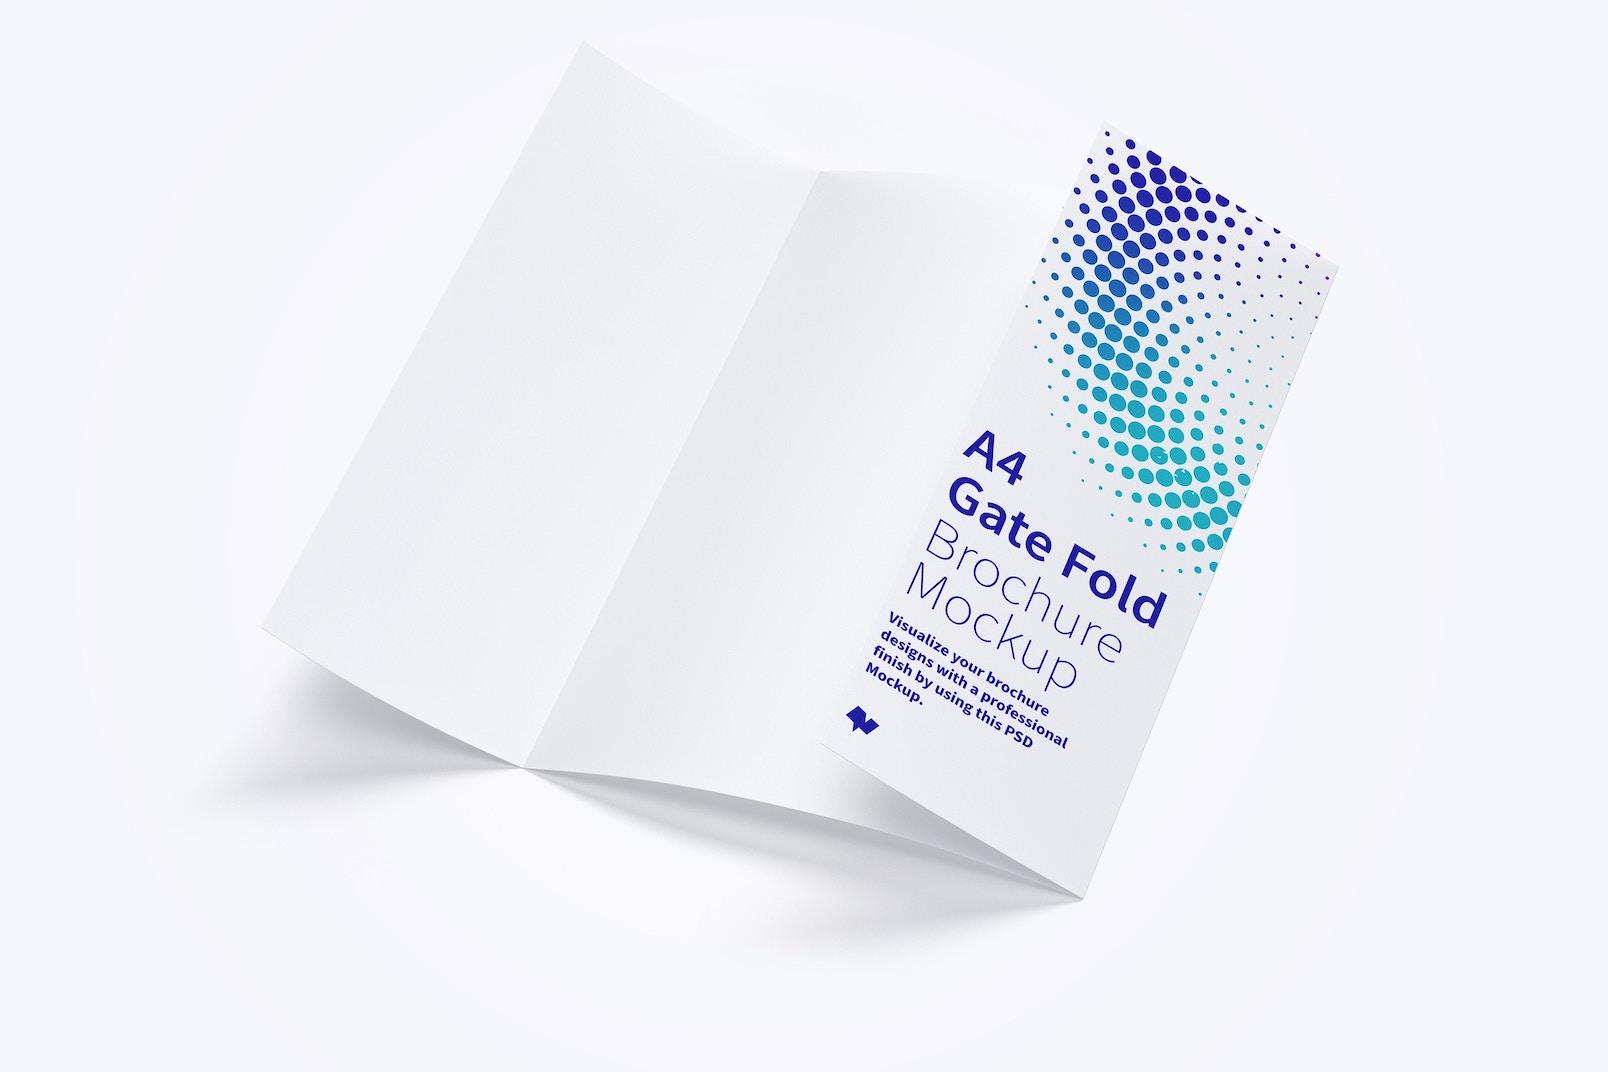 A4 Gate Fold Brochure Mockup 02